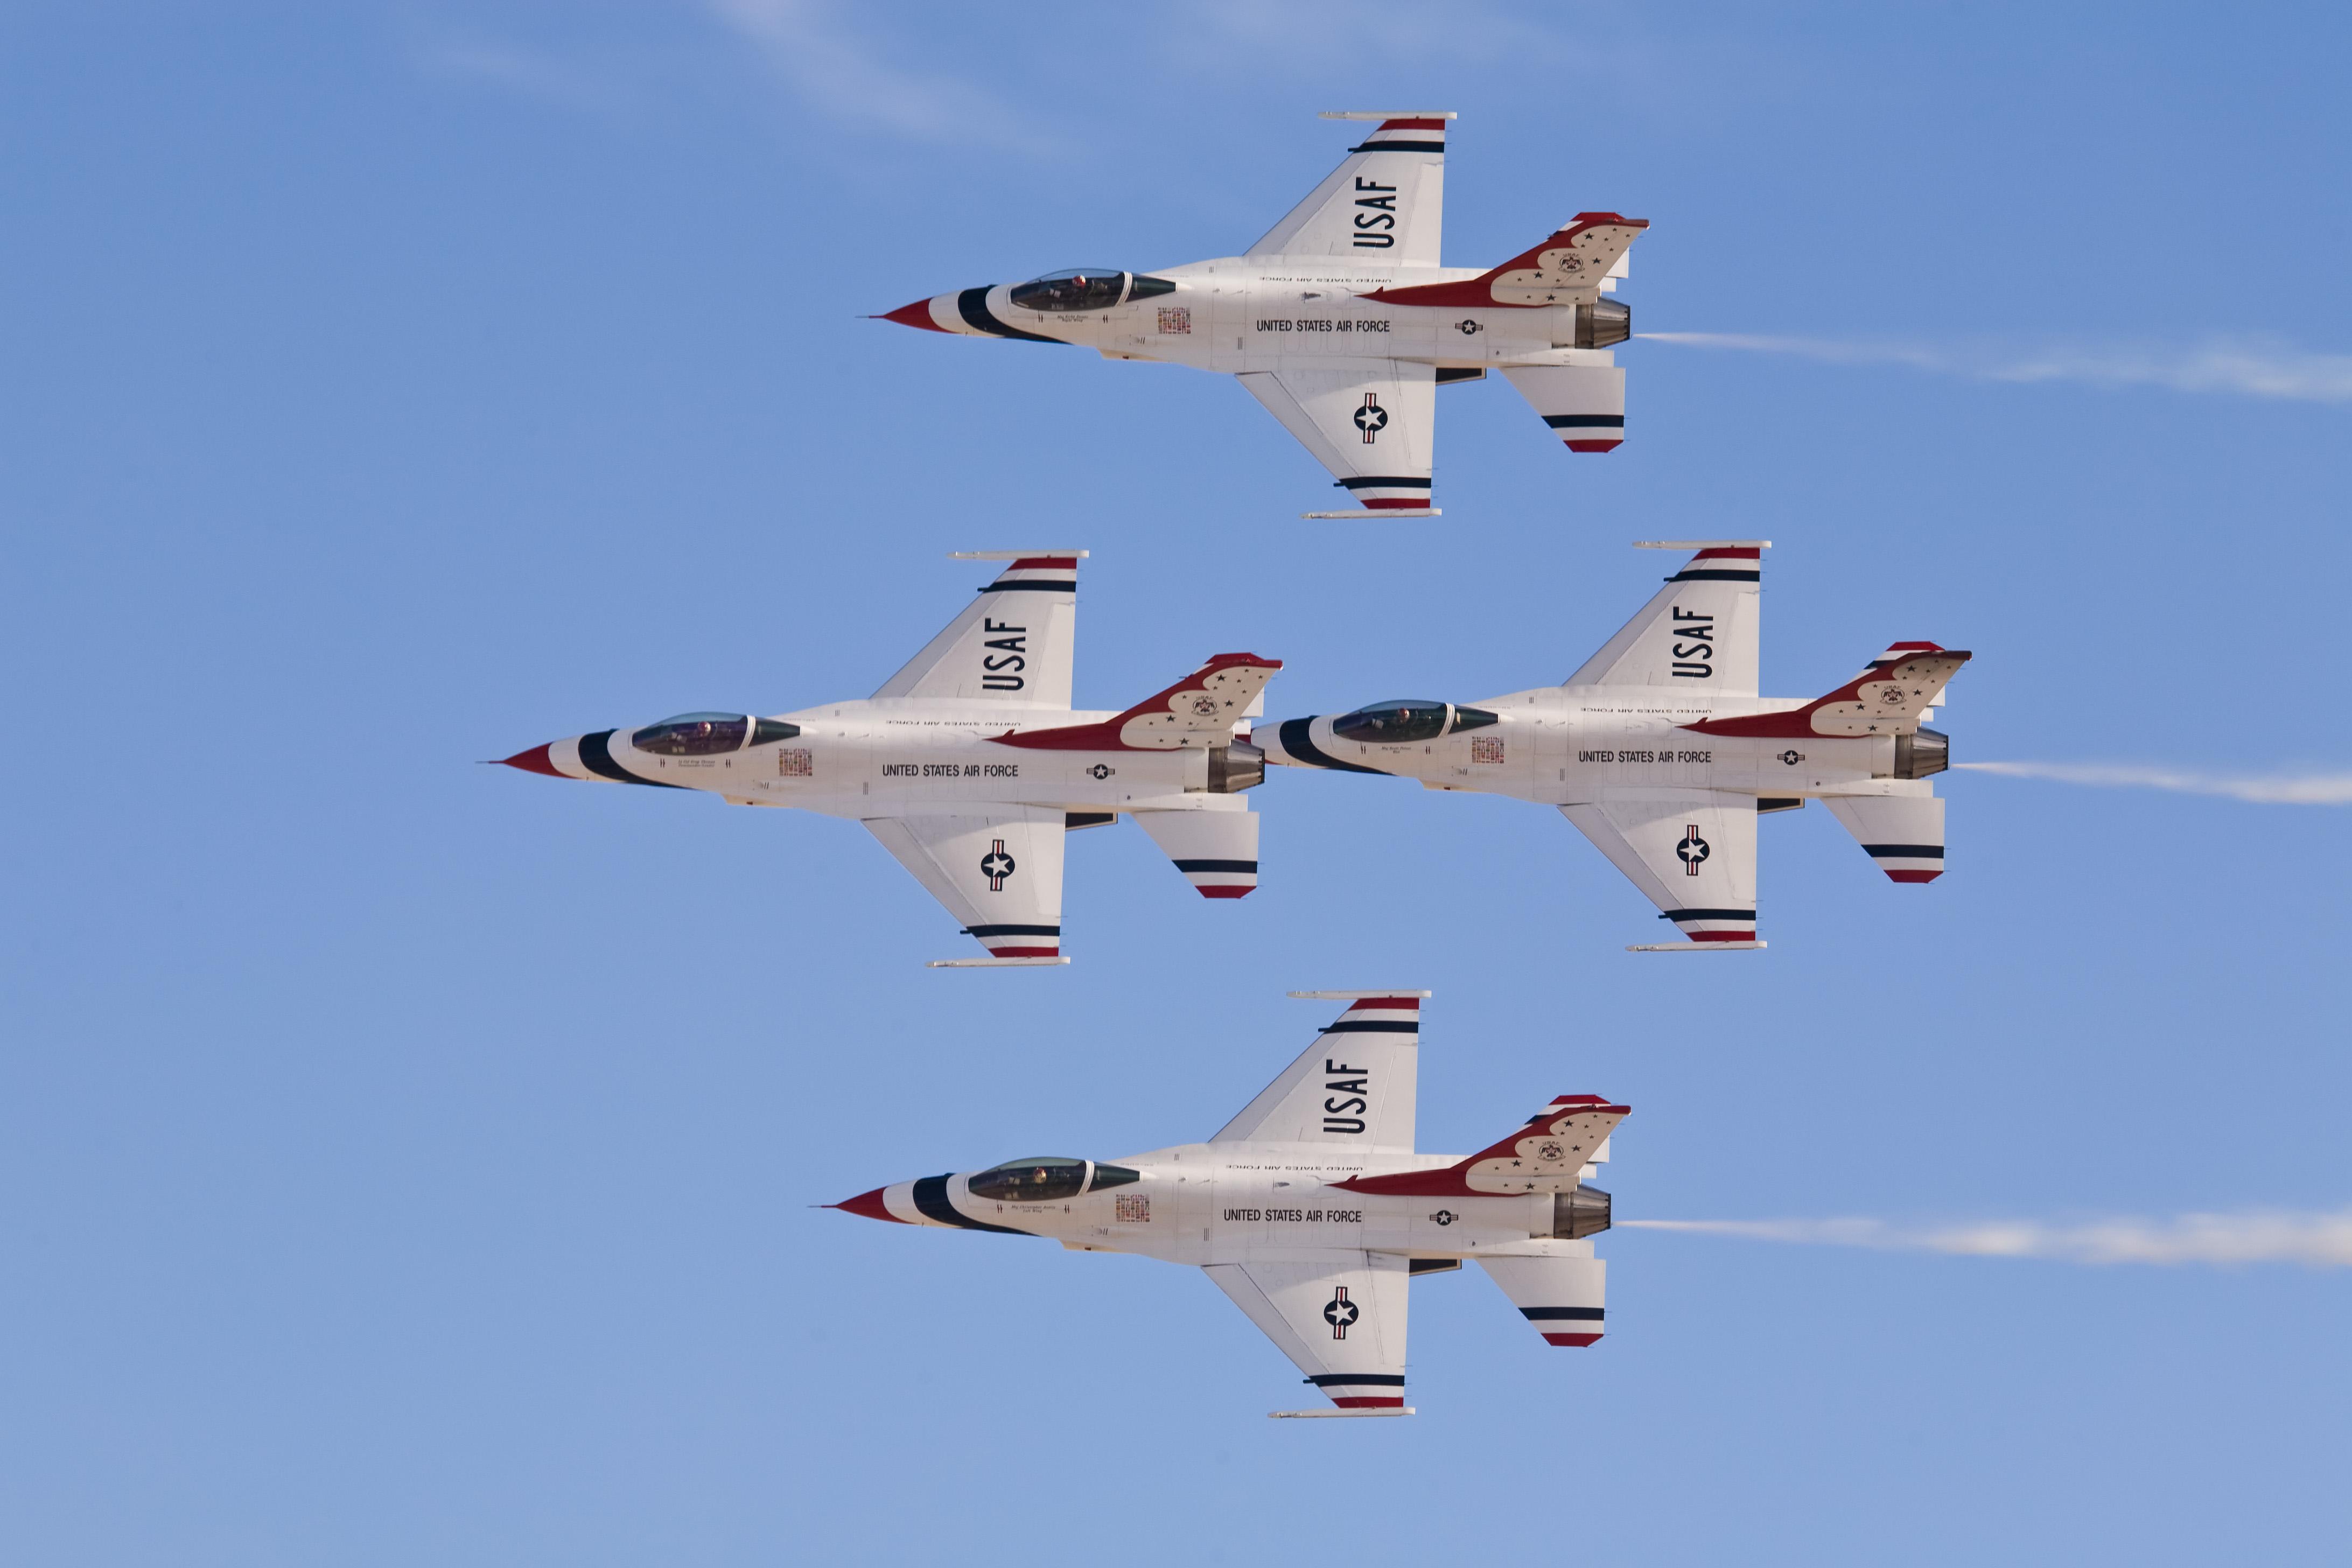 us air force usaf thunderbirds perform at aviation HD Wallpaper of 4368x2912